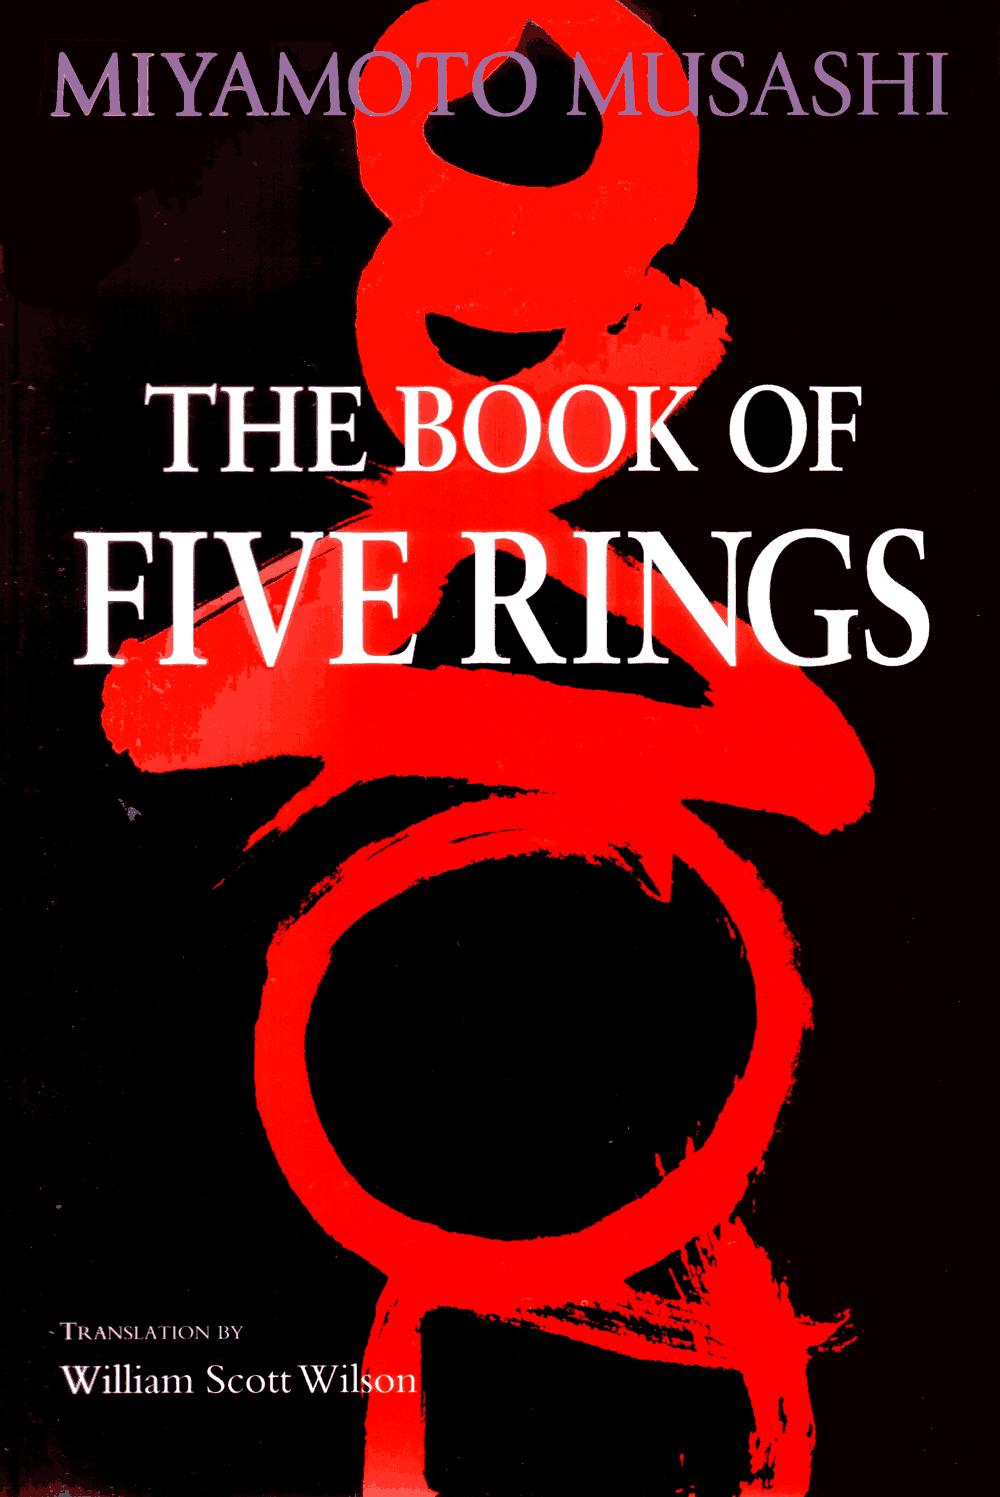 MyamotoMusashiThe book of five ringsTranslation by William Scott Wilson